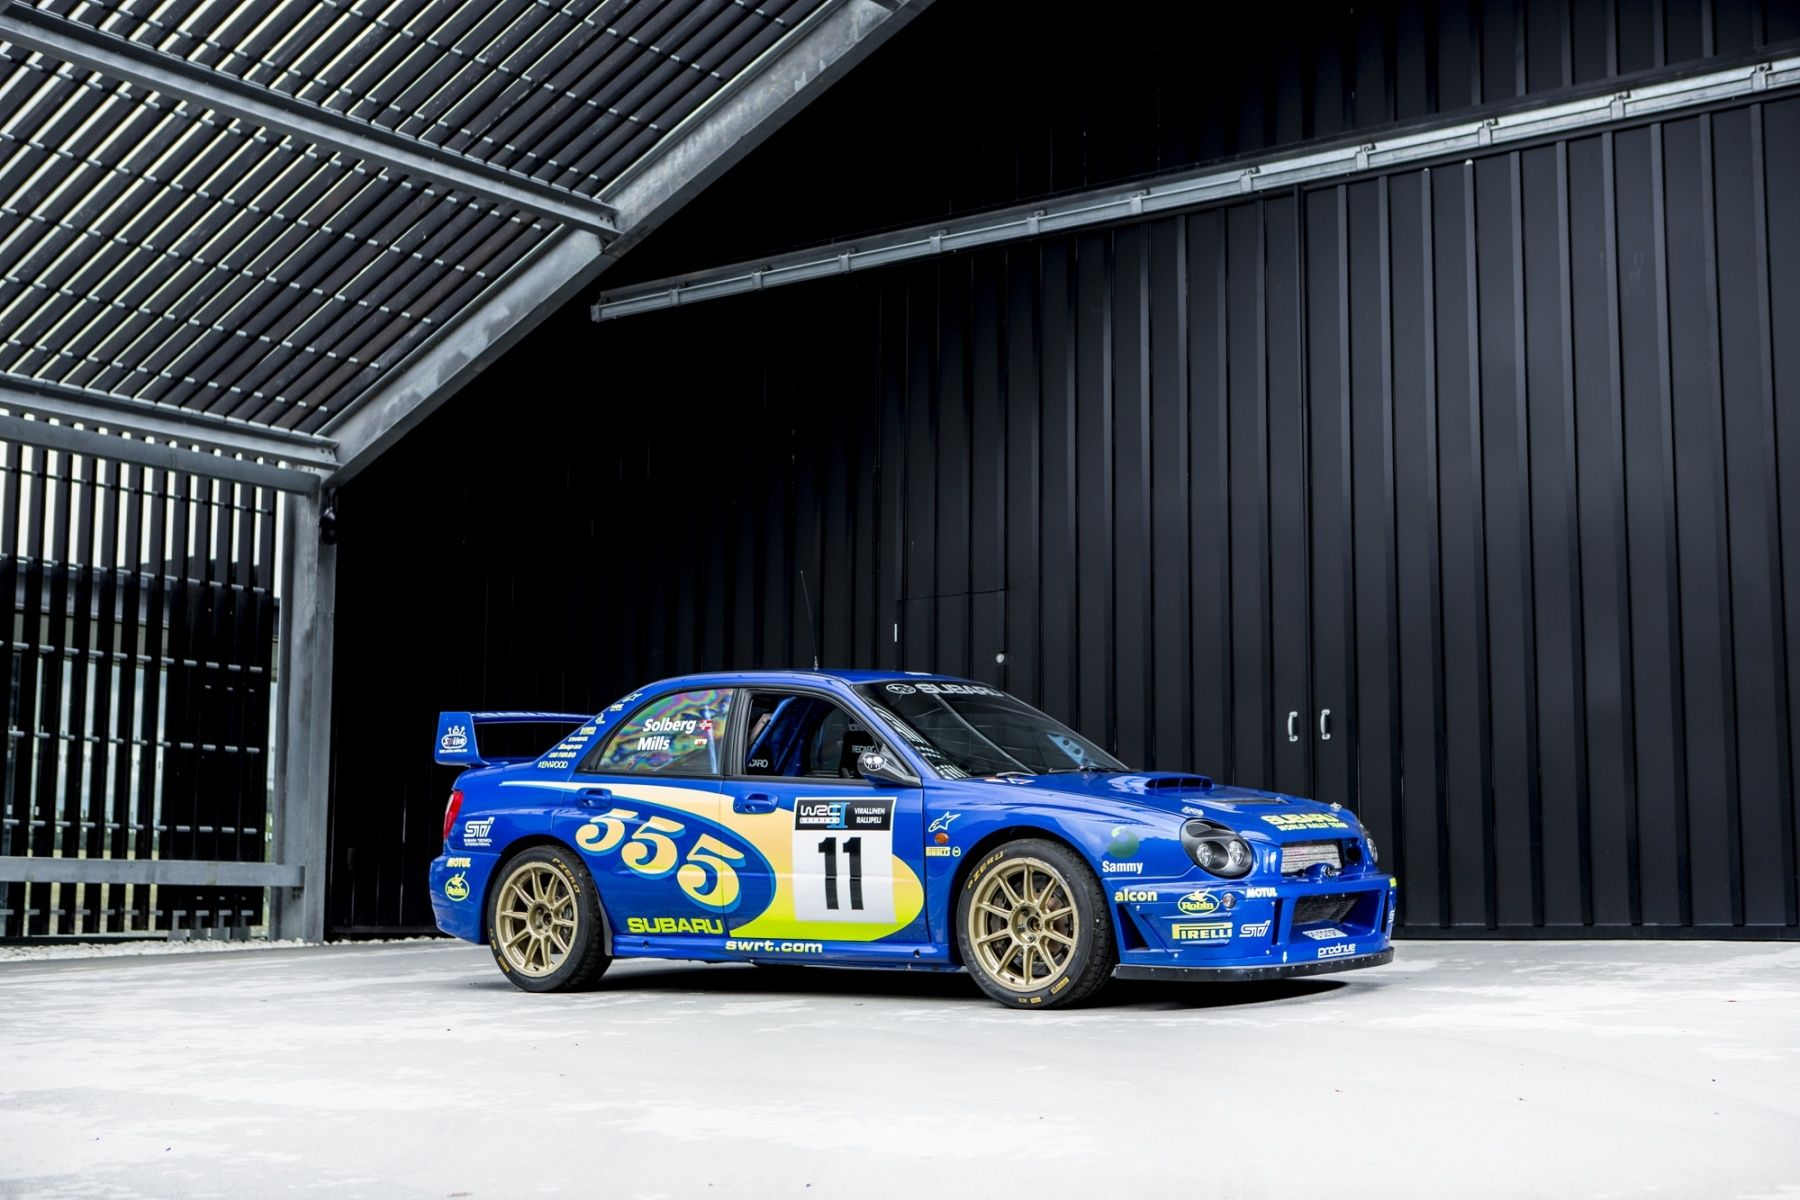 2002 Subaru Impreza Wrc Classic Driver Market Subaru Subaru Impreza Wrc Subaru Impreza